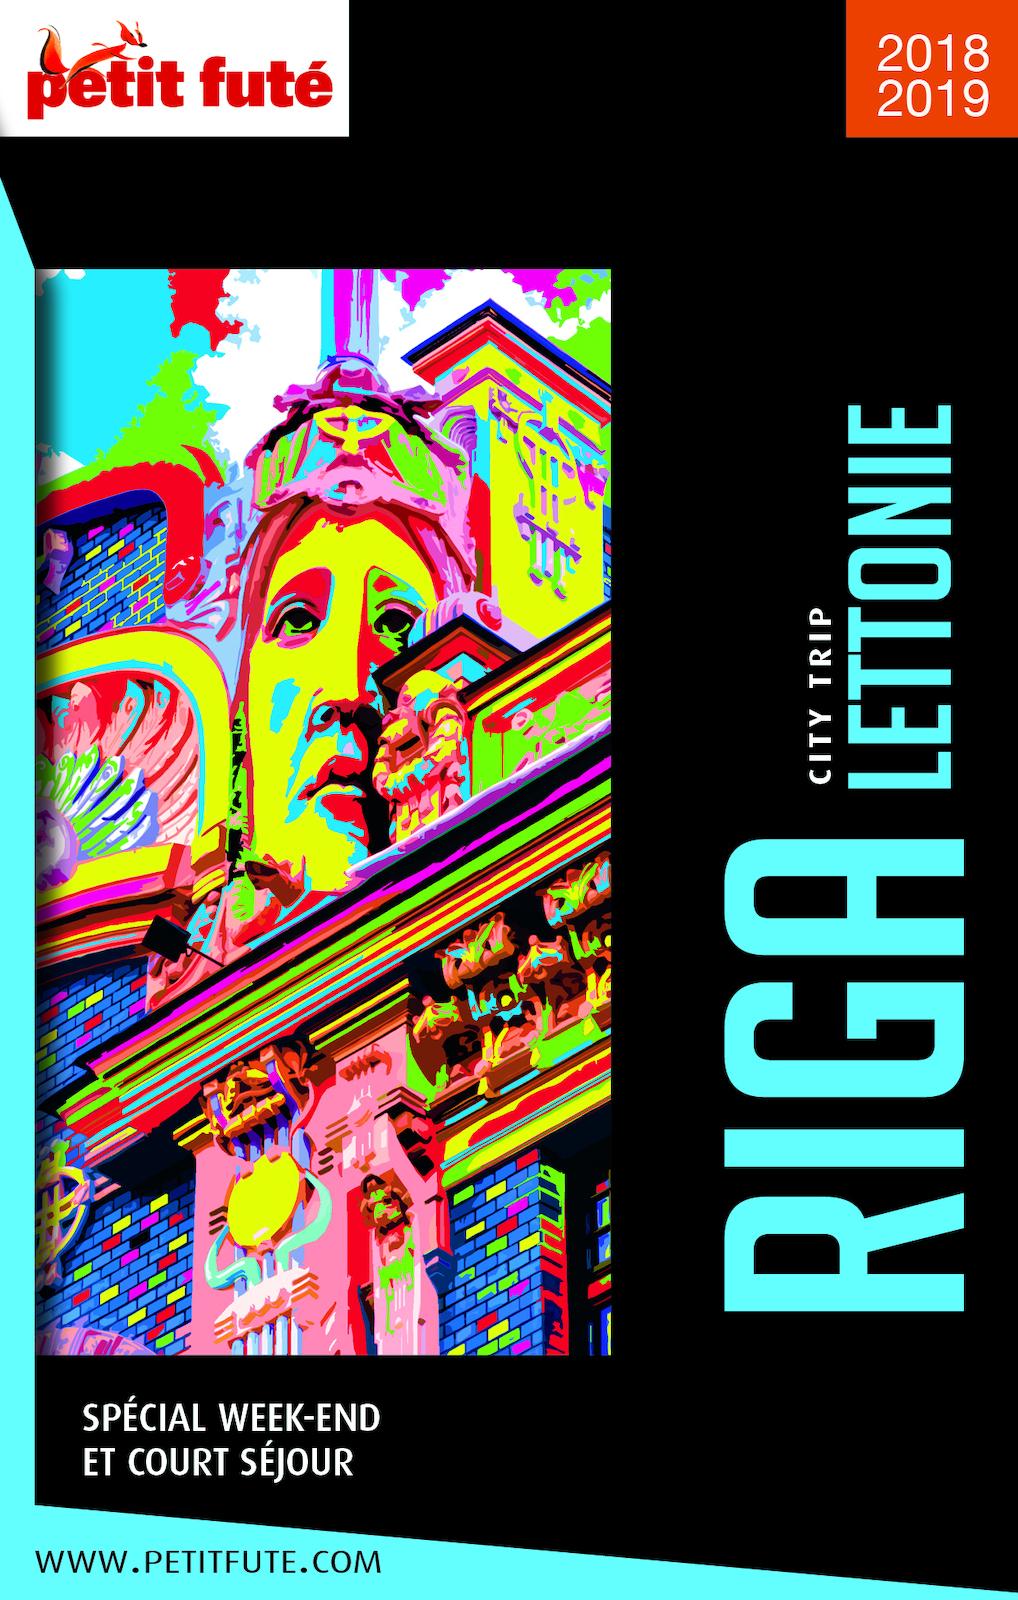 RIGA - LETTONIE CITY TRIP 2018/2019 City trip Petit Futé